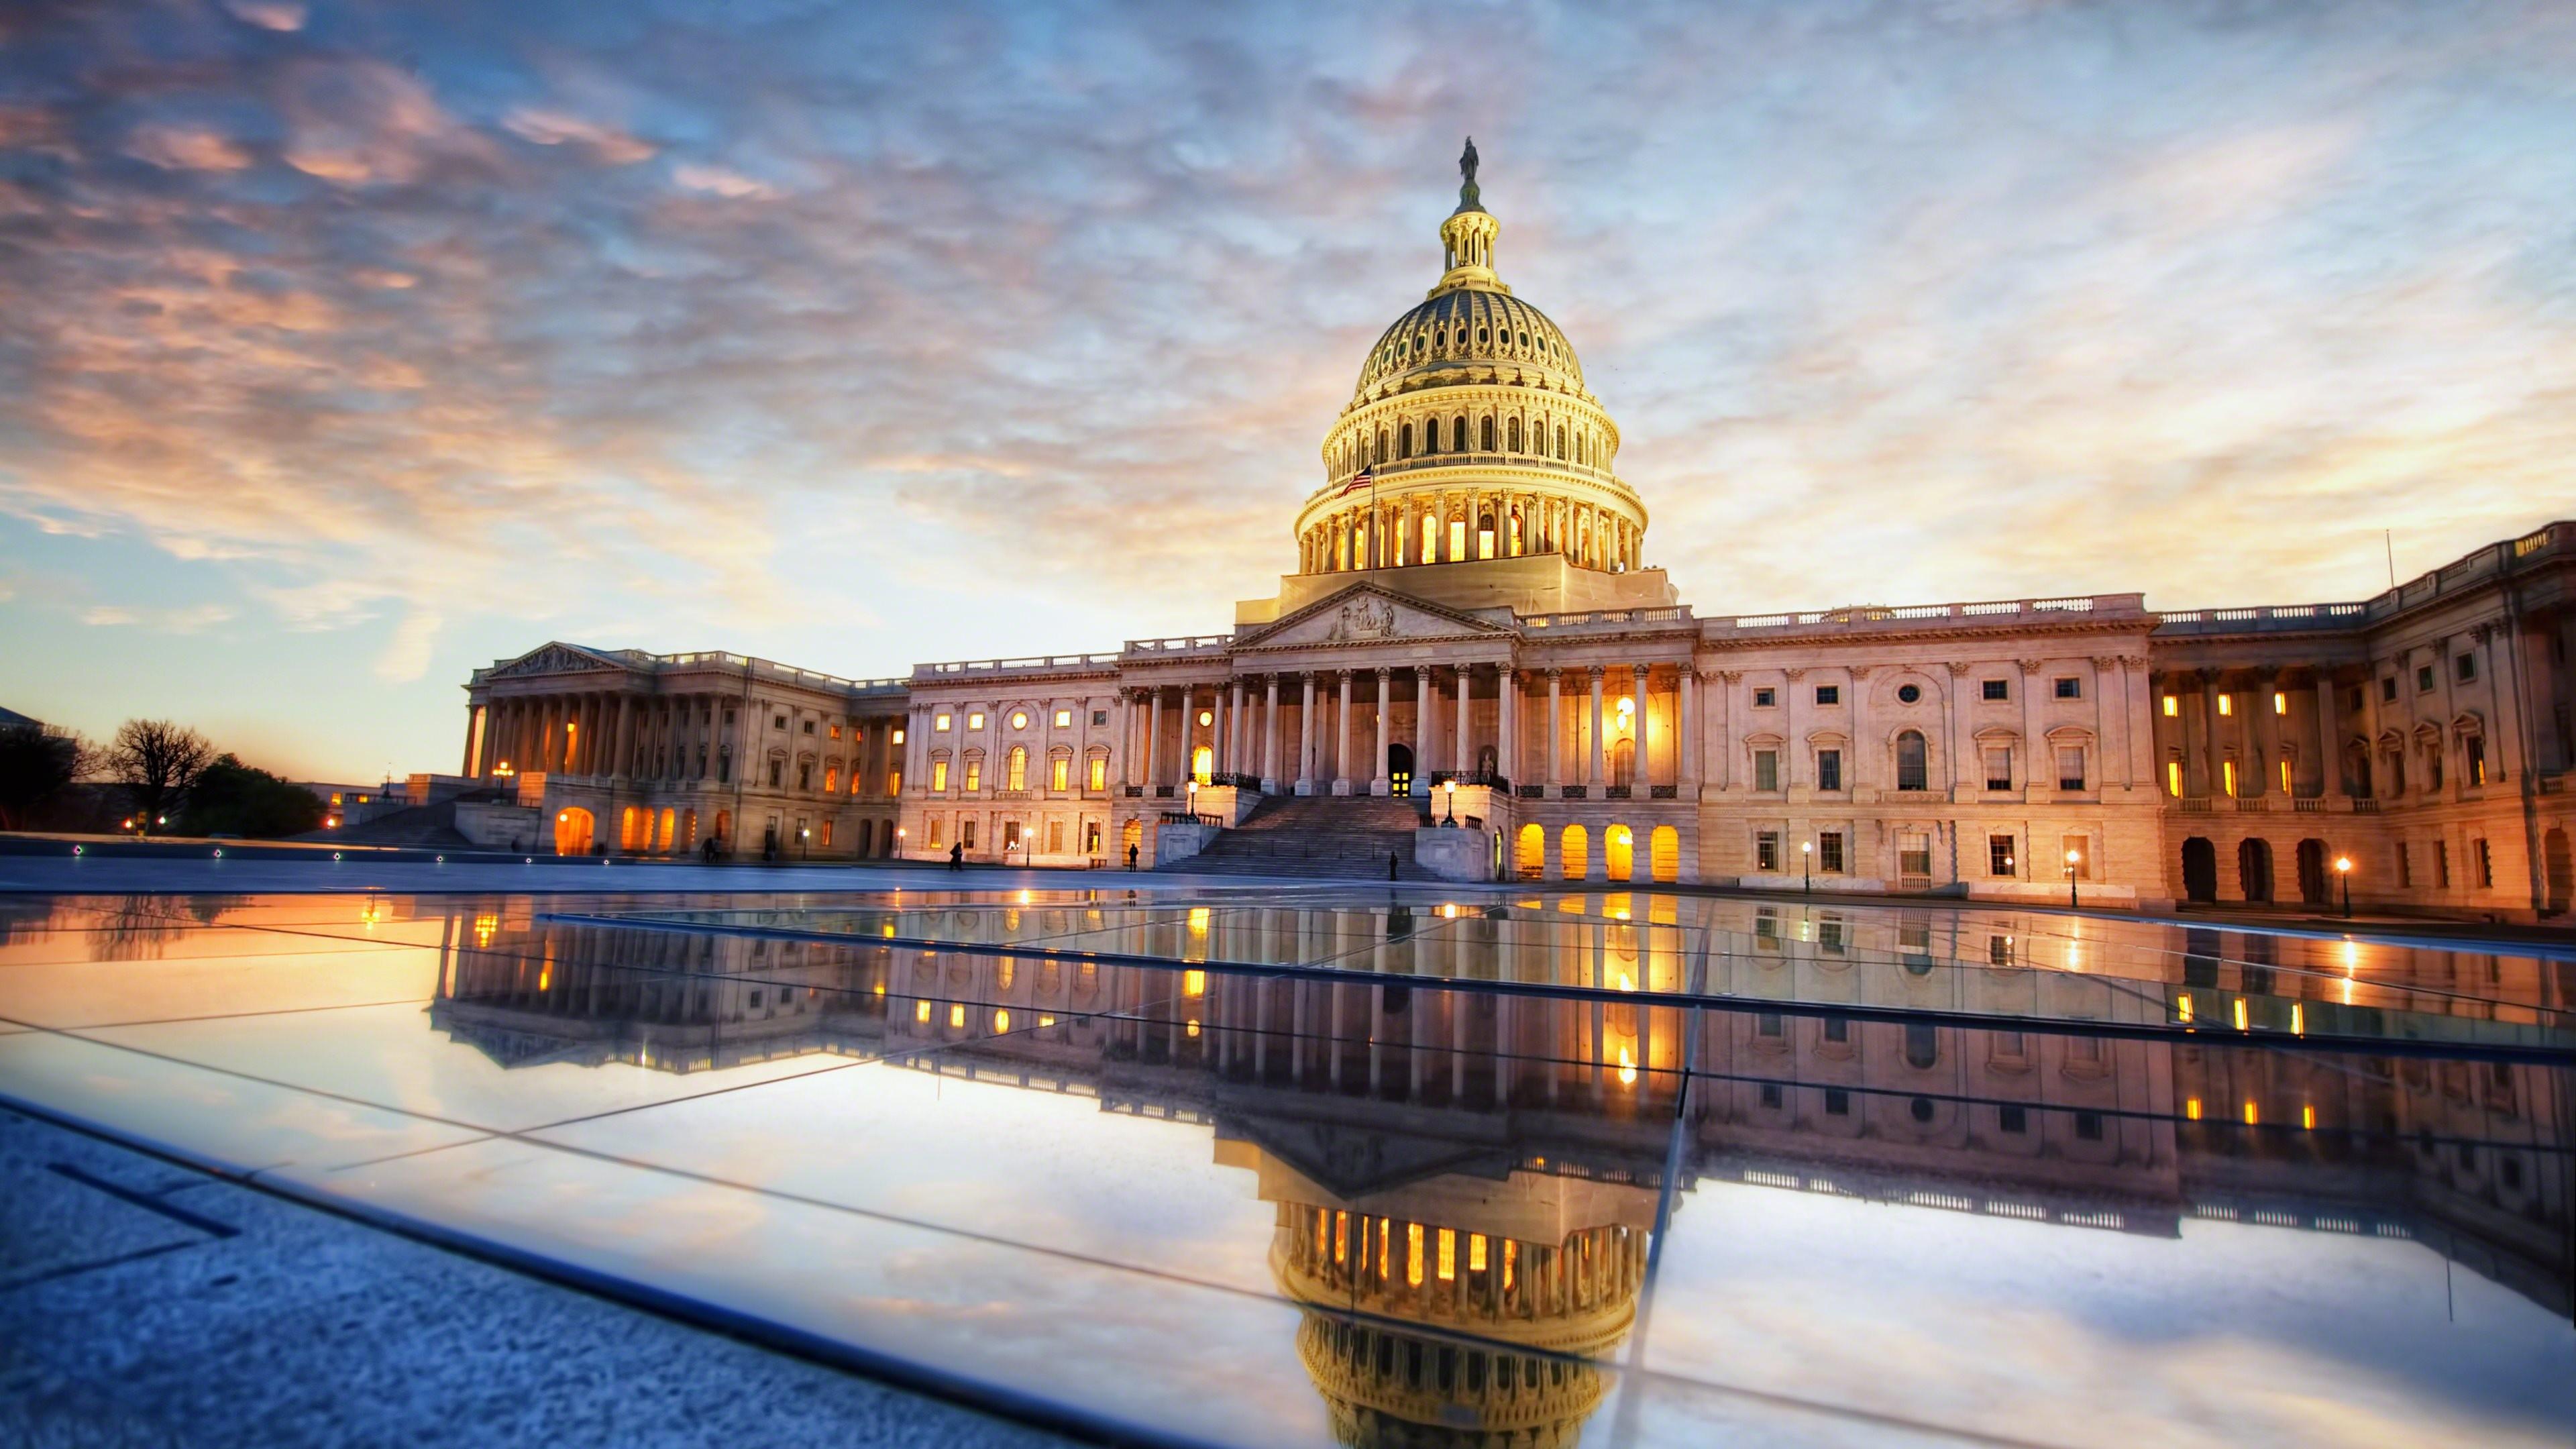 Wallpaper: U.S. Capitol Sunrise Reflection